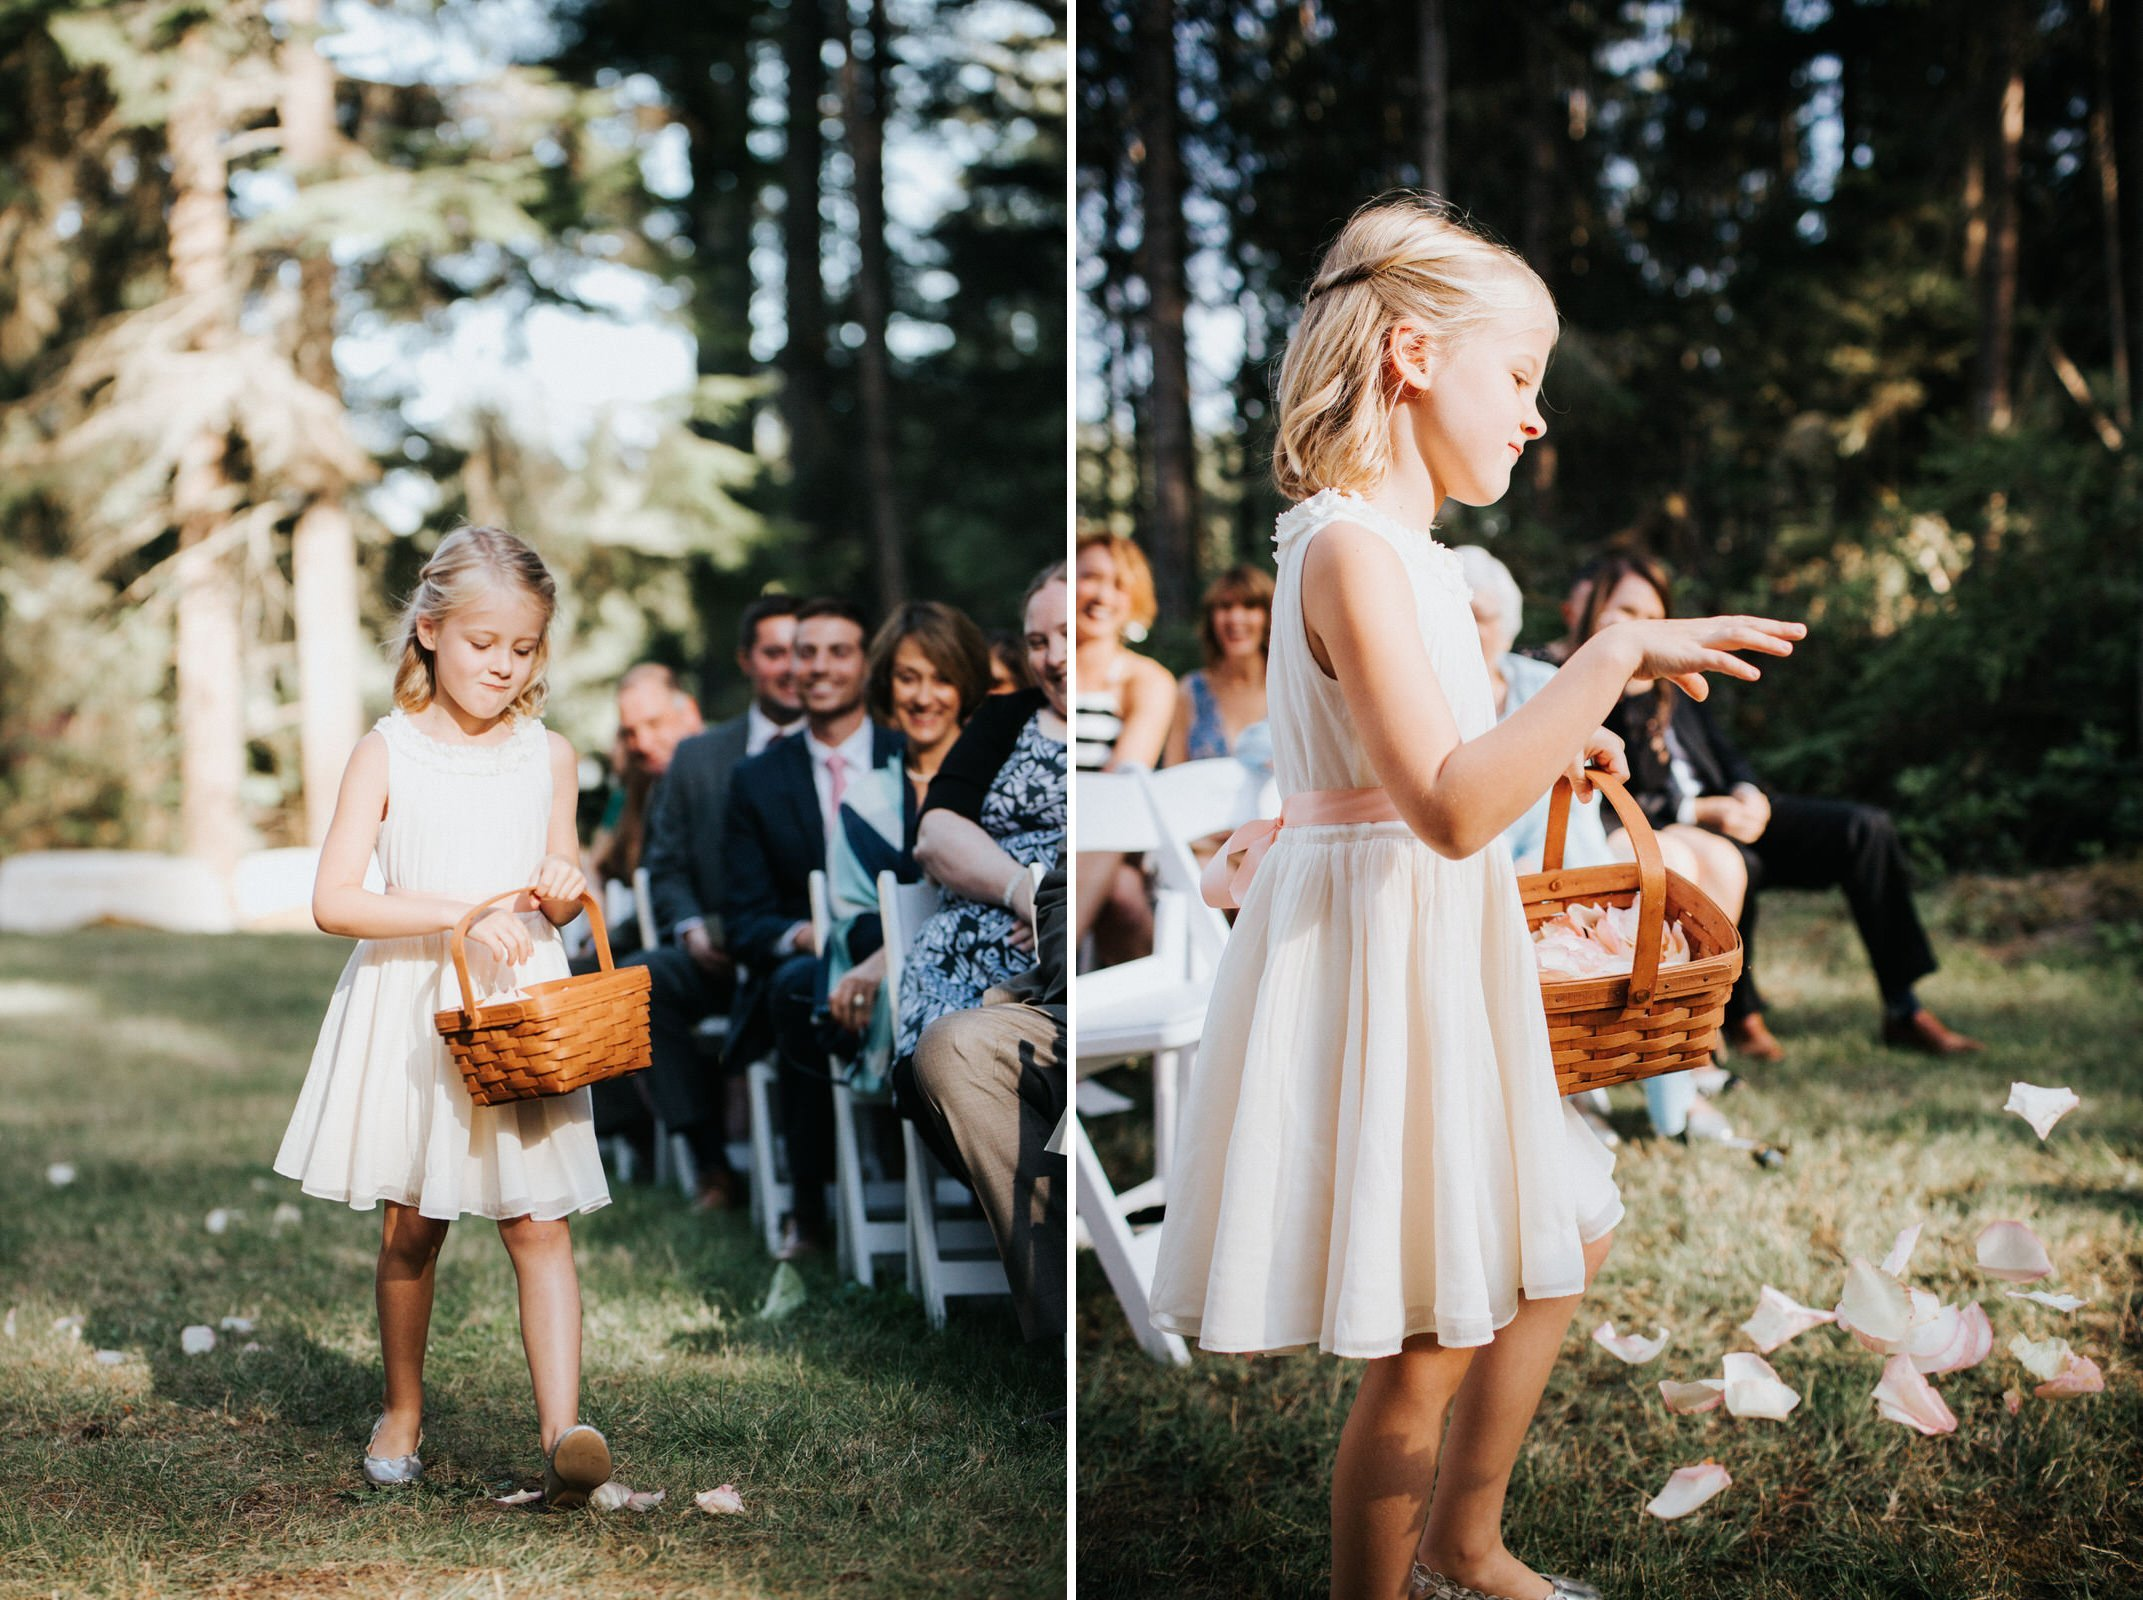 Wiley Putnam Whidbey Island Wedding